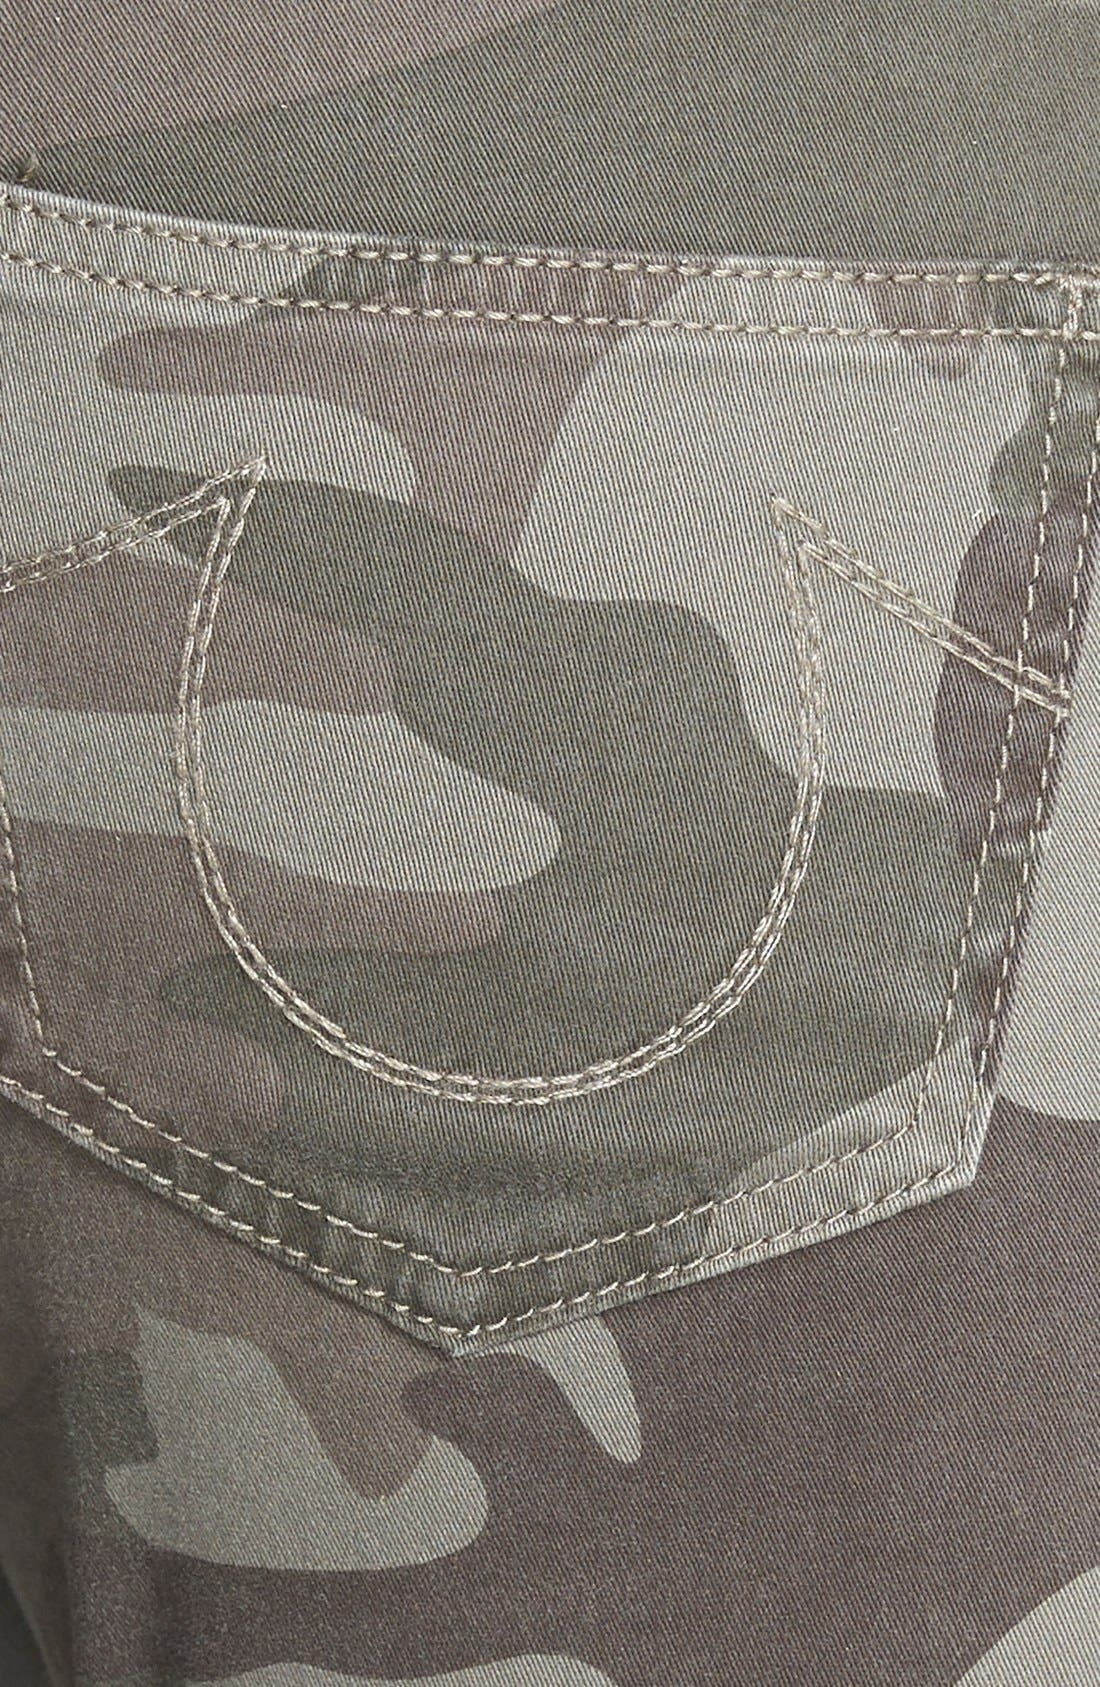 Alternate Image 3  - True Religion Brand Jeans Casey Print Super Skinny Jeans (Olive Camo)